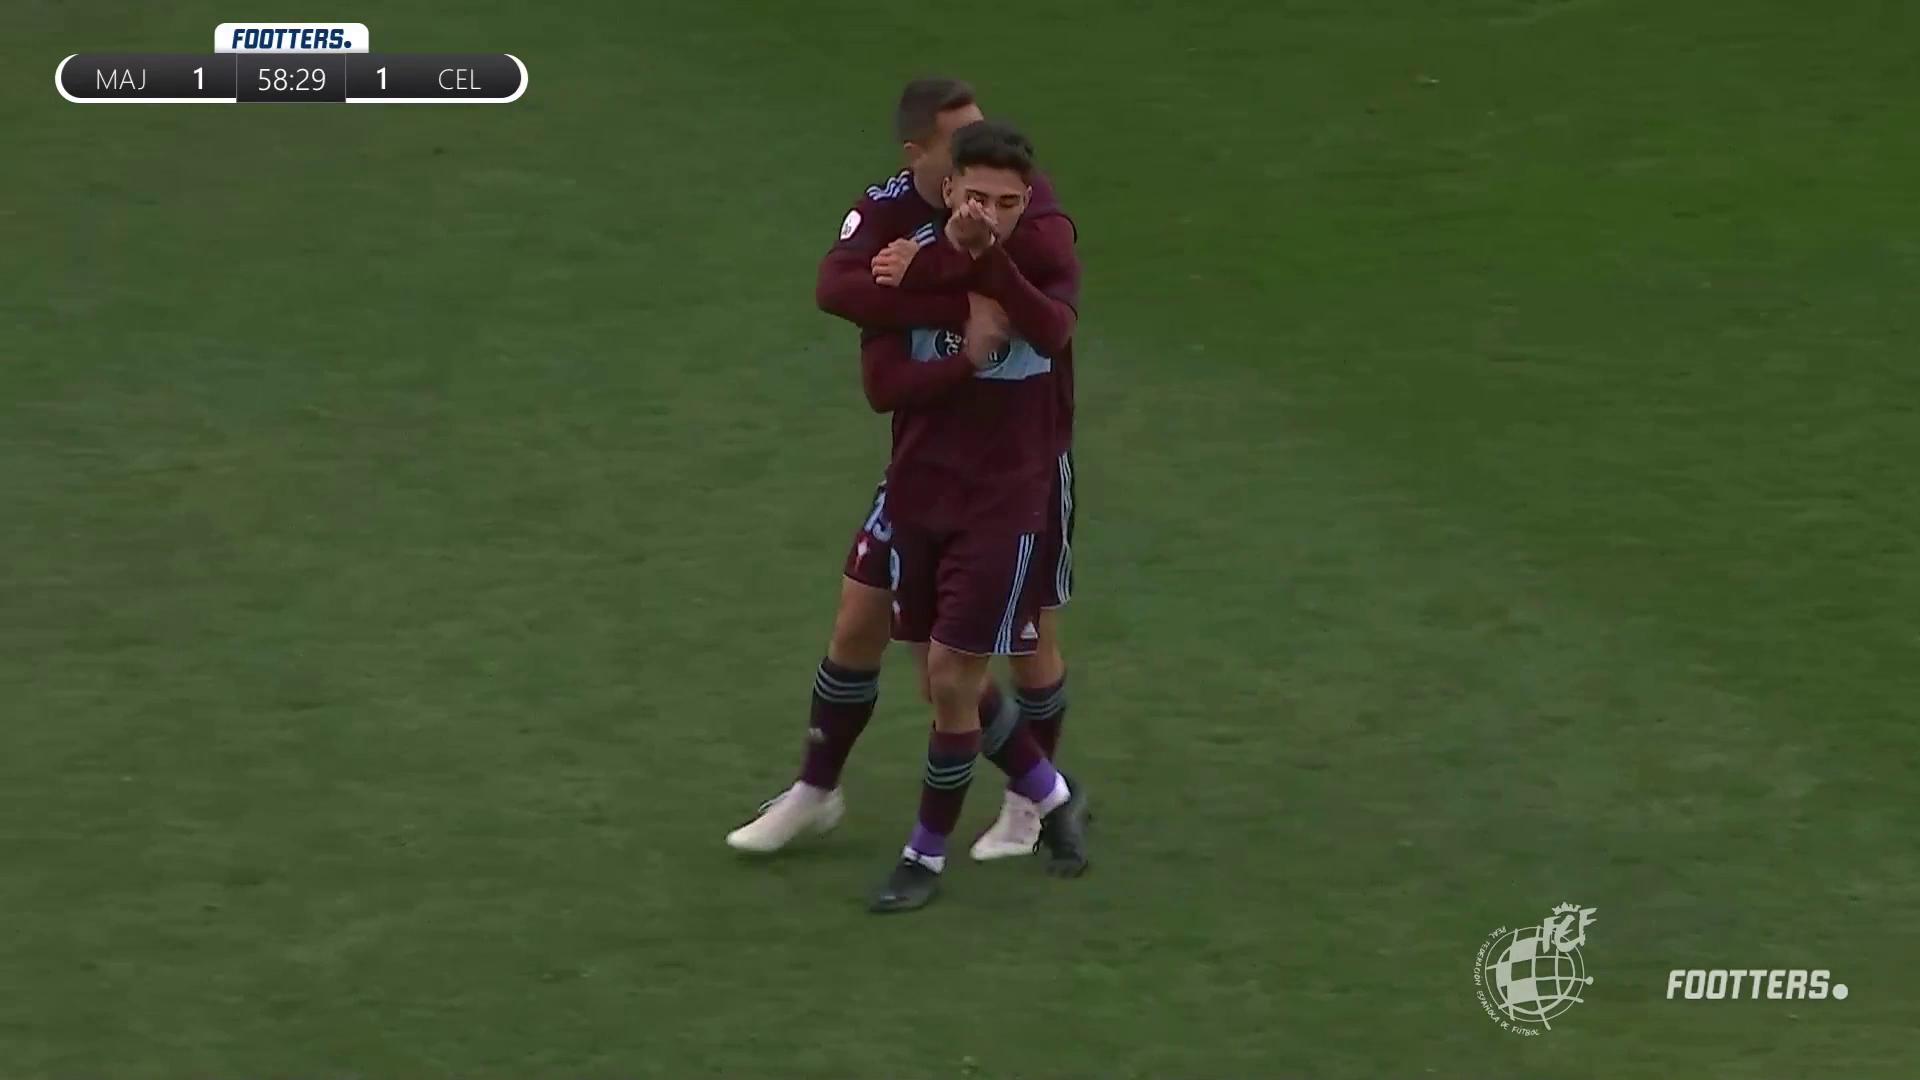 Javi Gómez del Celta B celebrando el gol